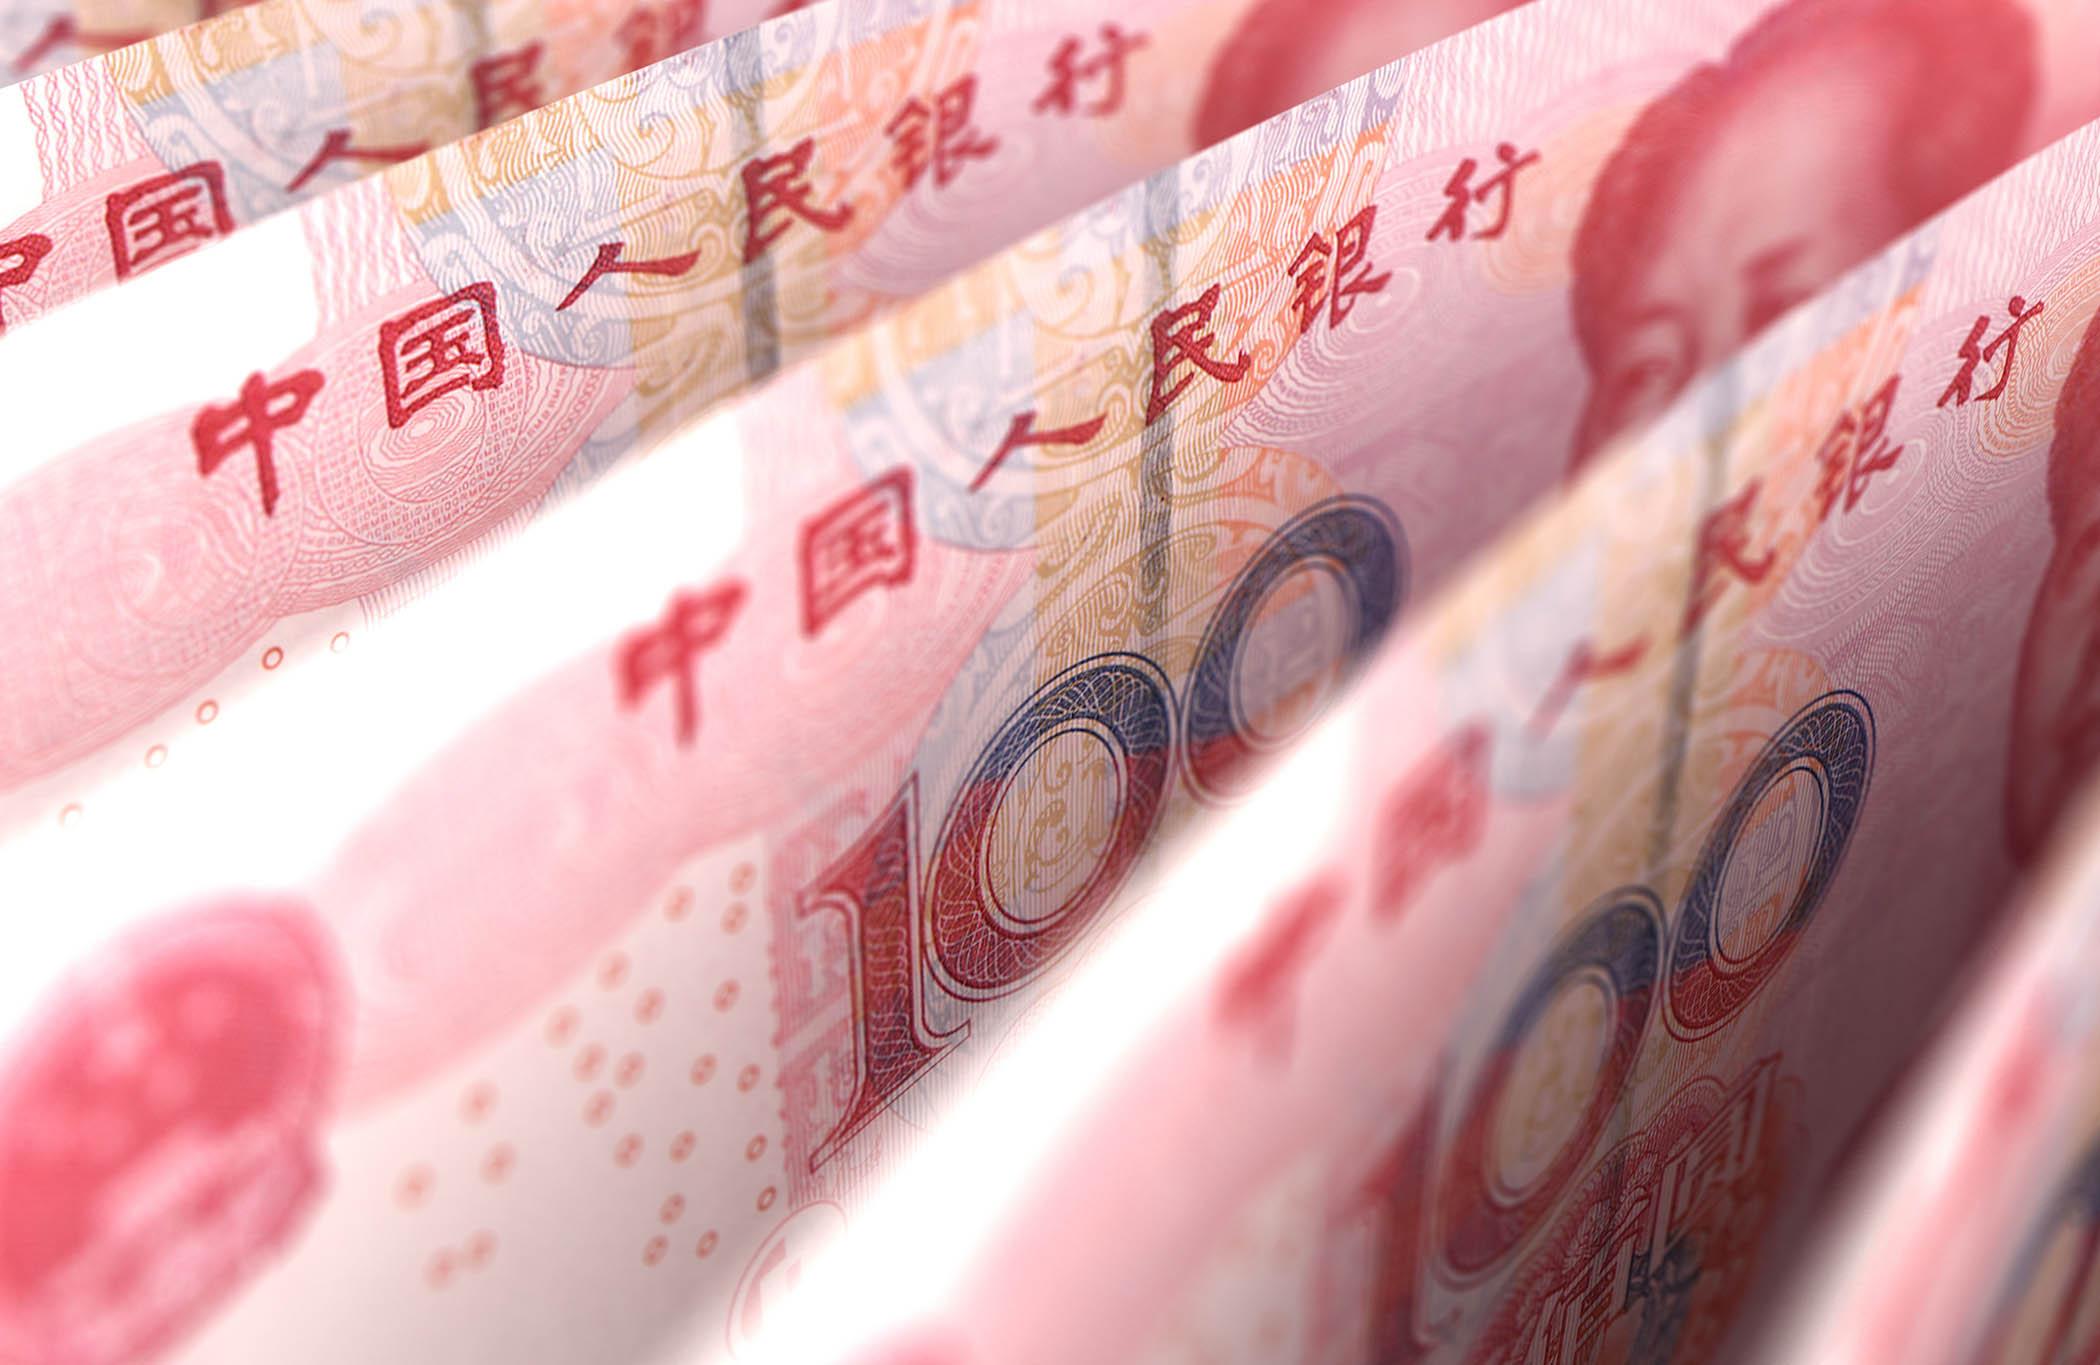 Yuan Halts Six-Week Run of Losses as China Seen Limiting Drop - Bloomberg